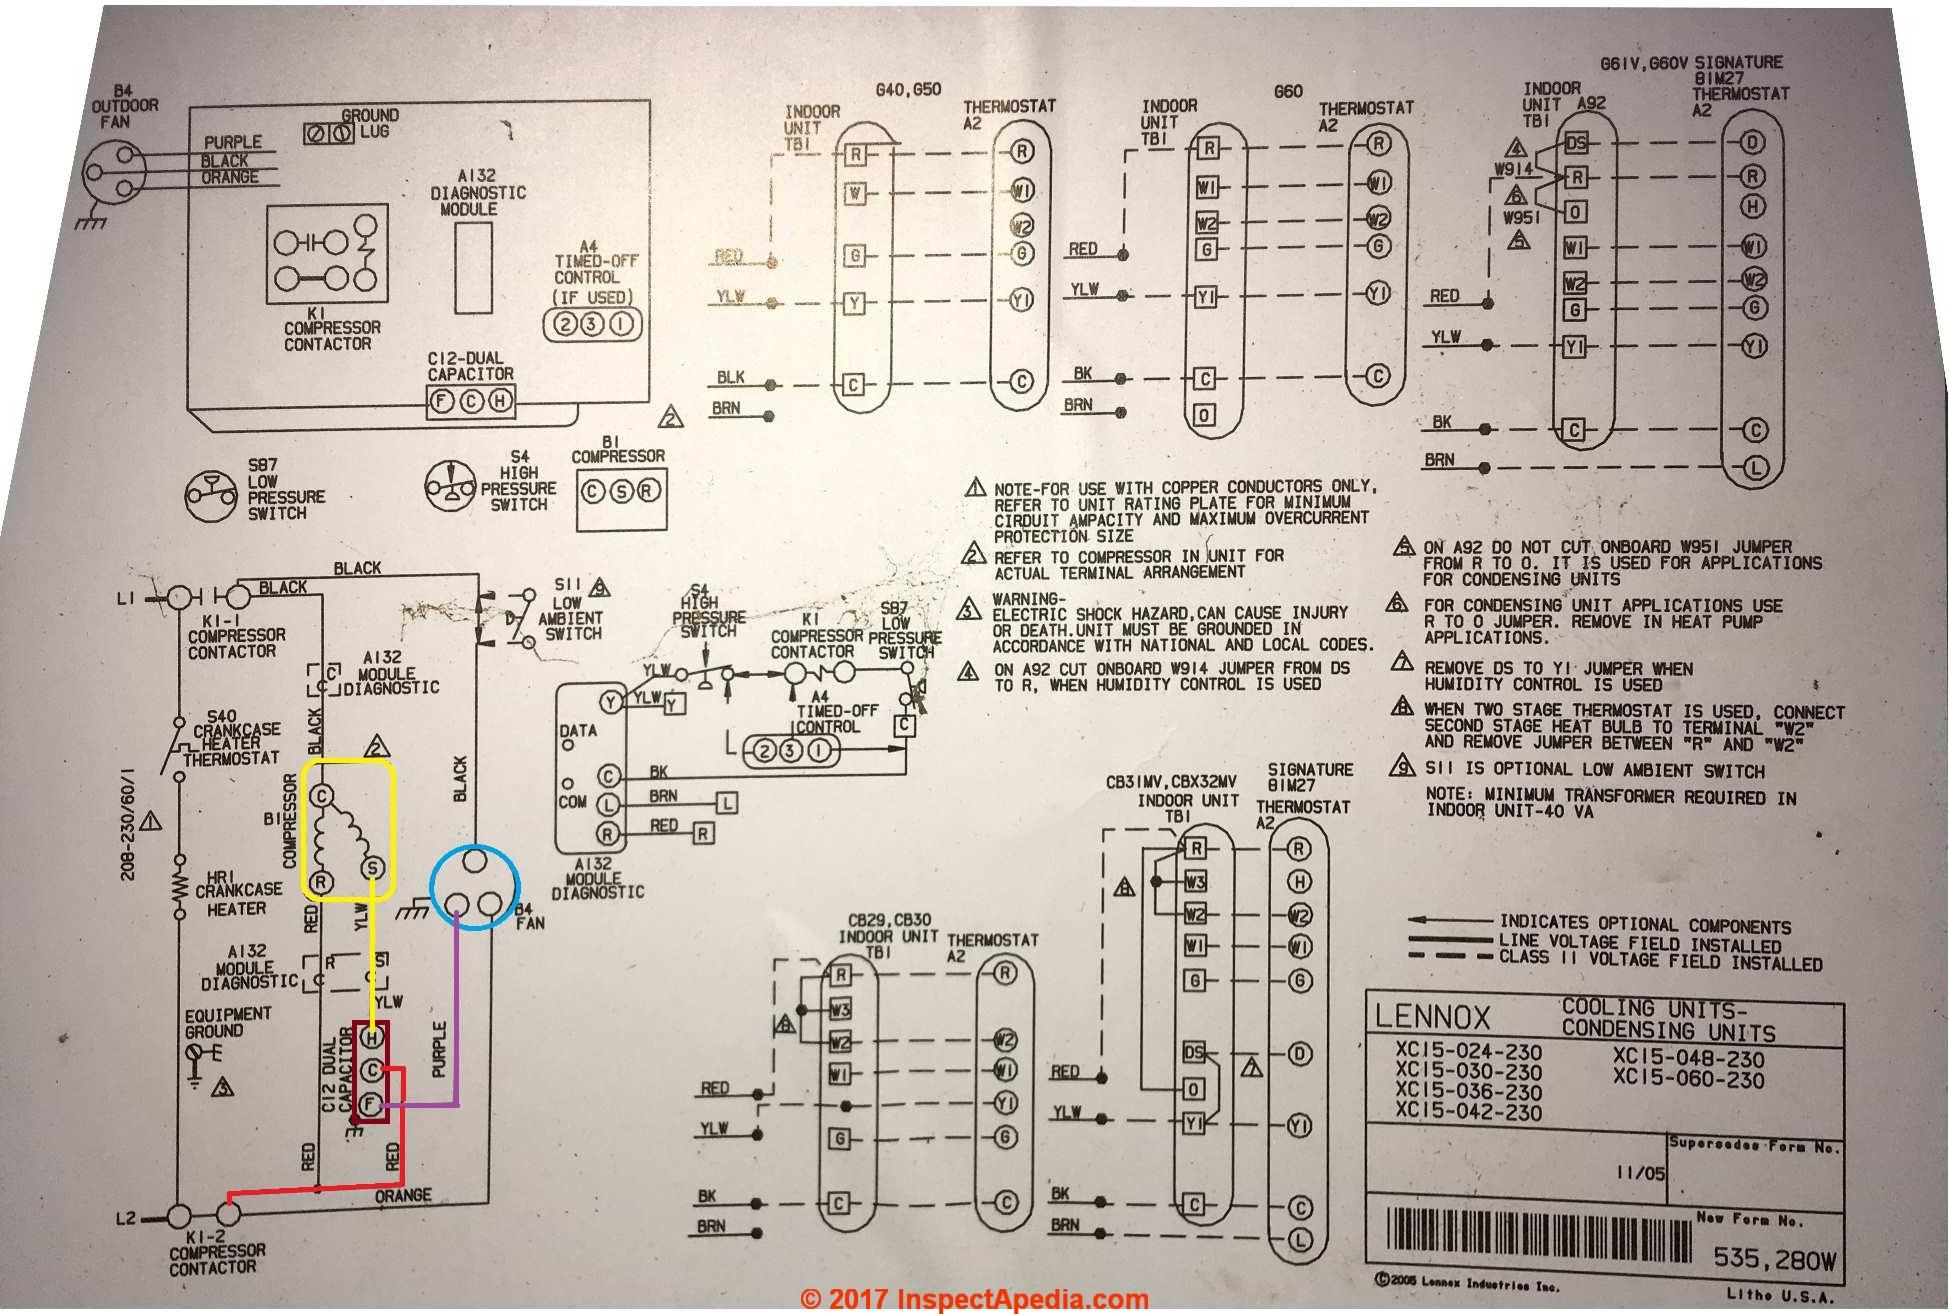 lennox wiring diagrams ezgo diagram electric golf cart motor starting and run capacitor types